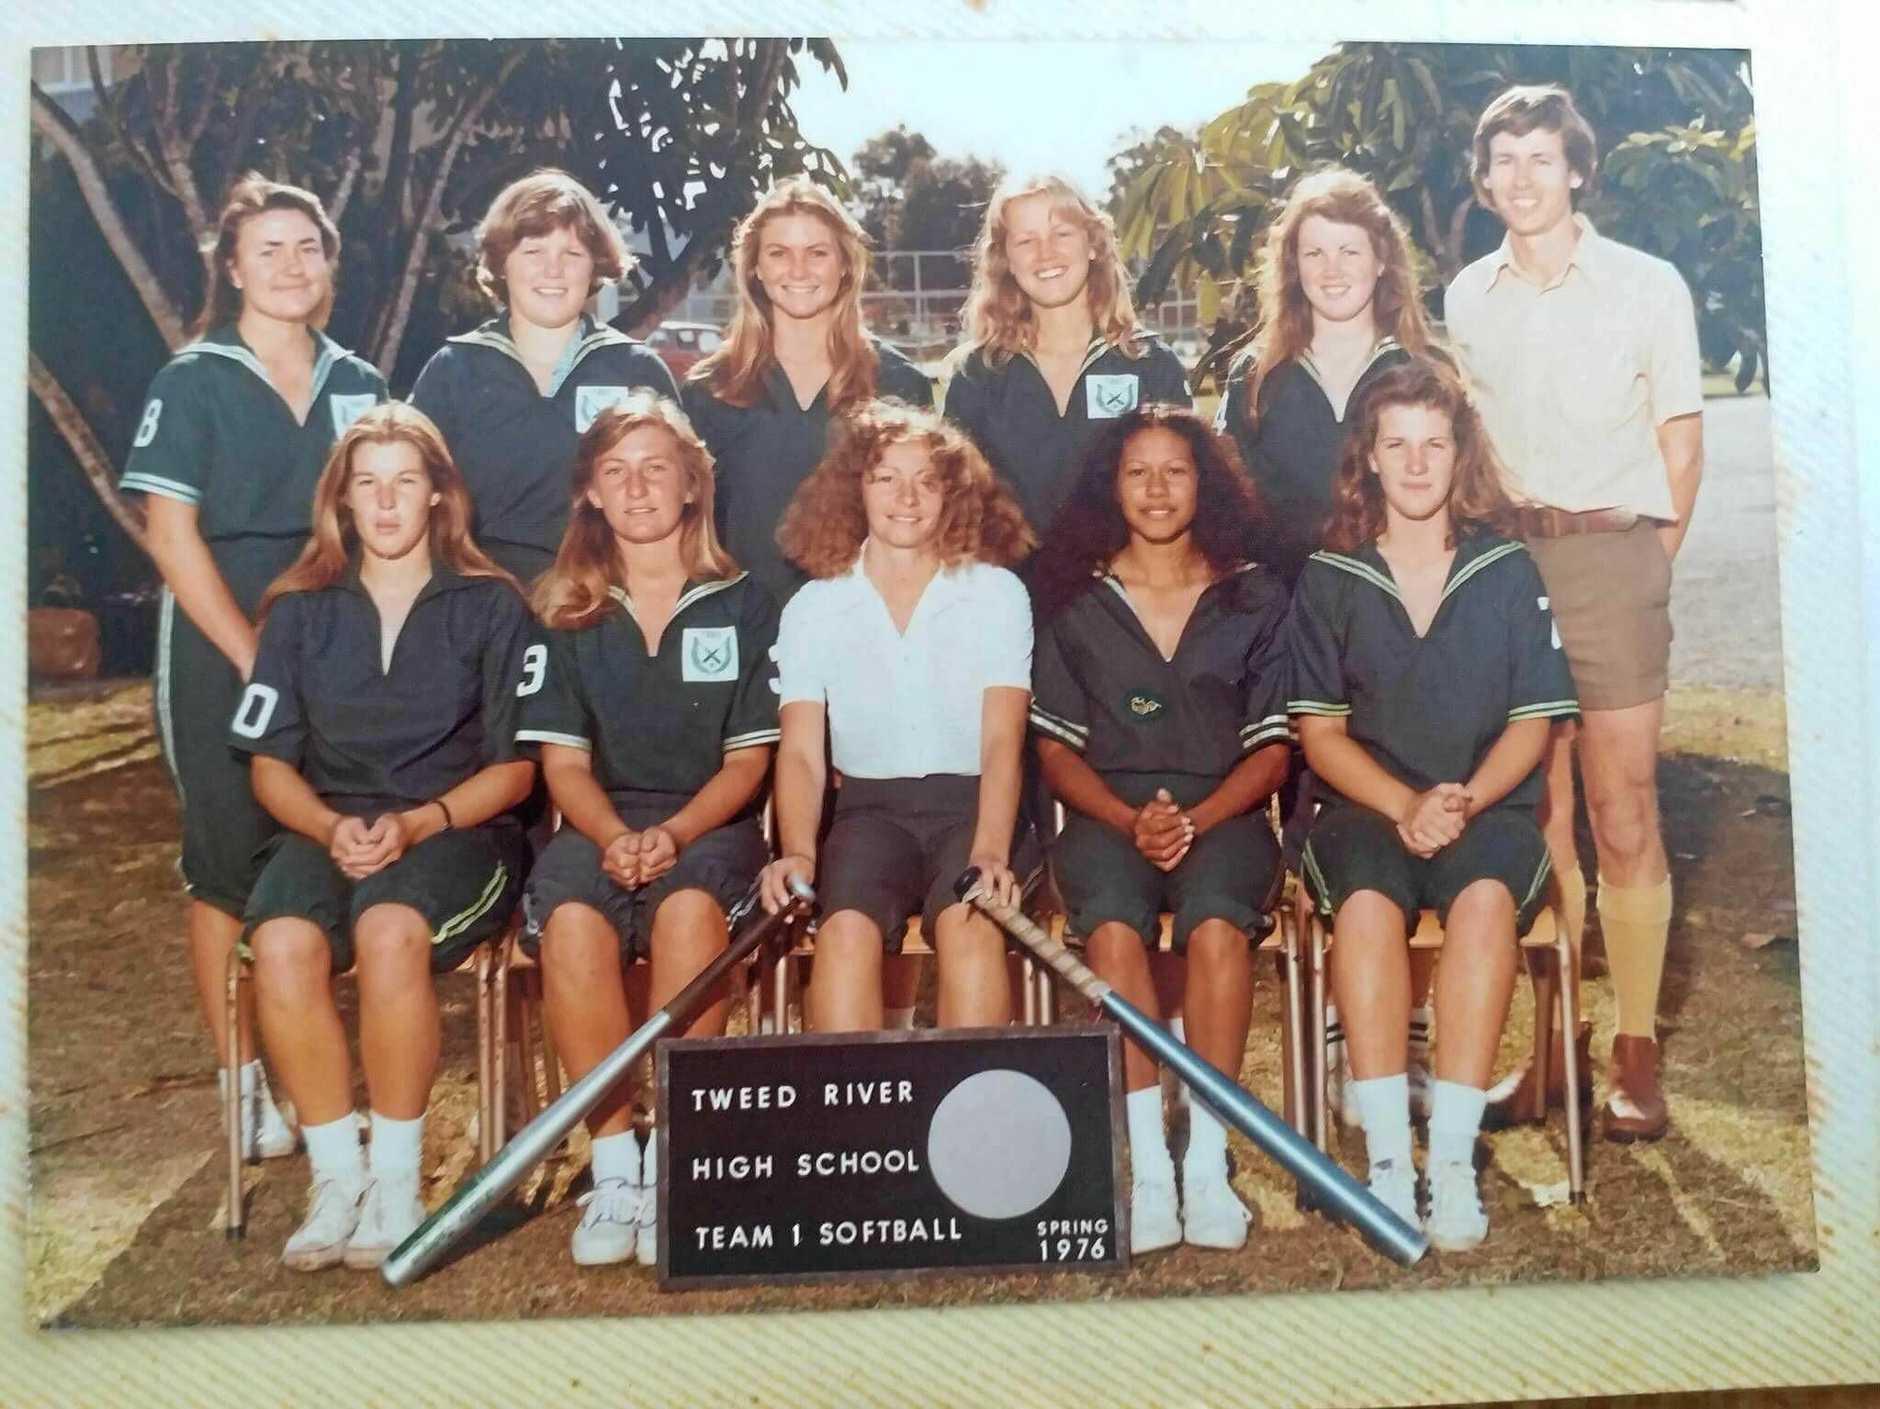 Team 1 softball, spring 1976.